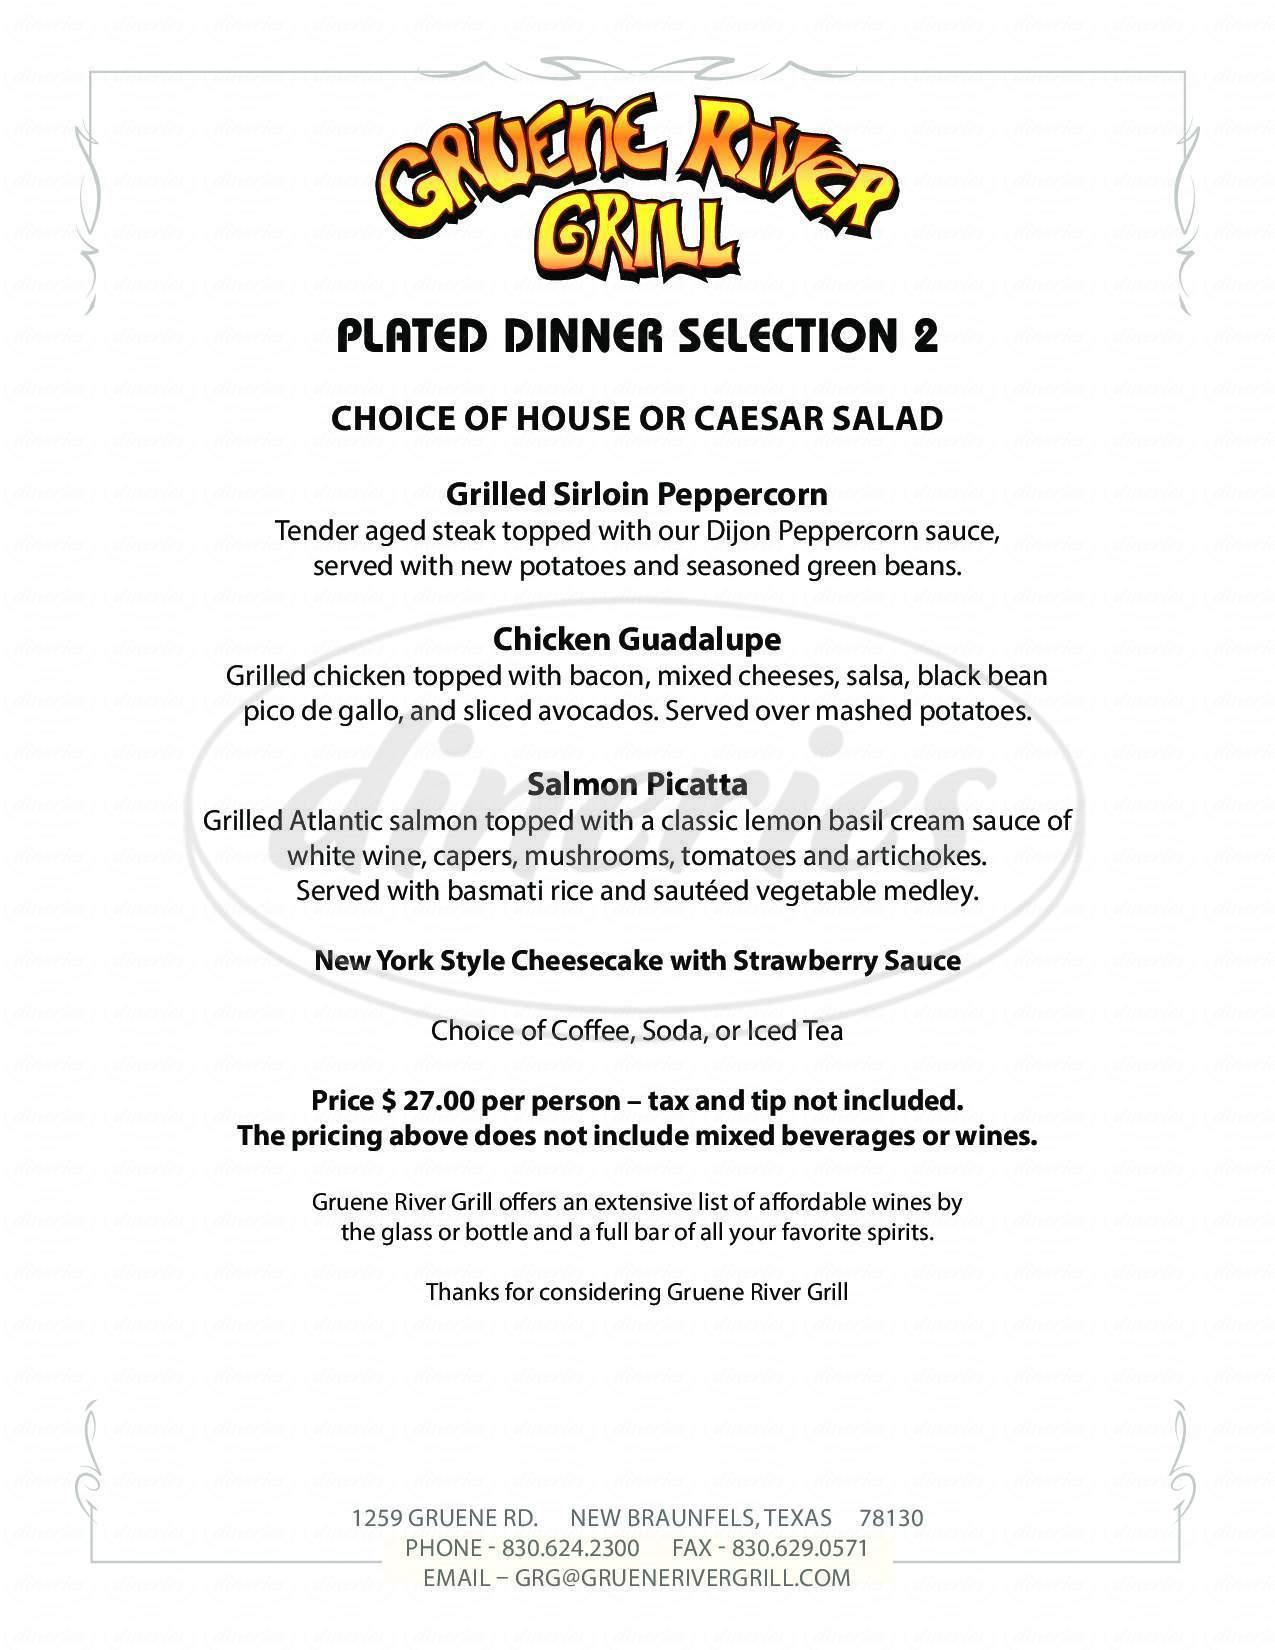 menu for Gruene River Grill